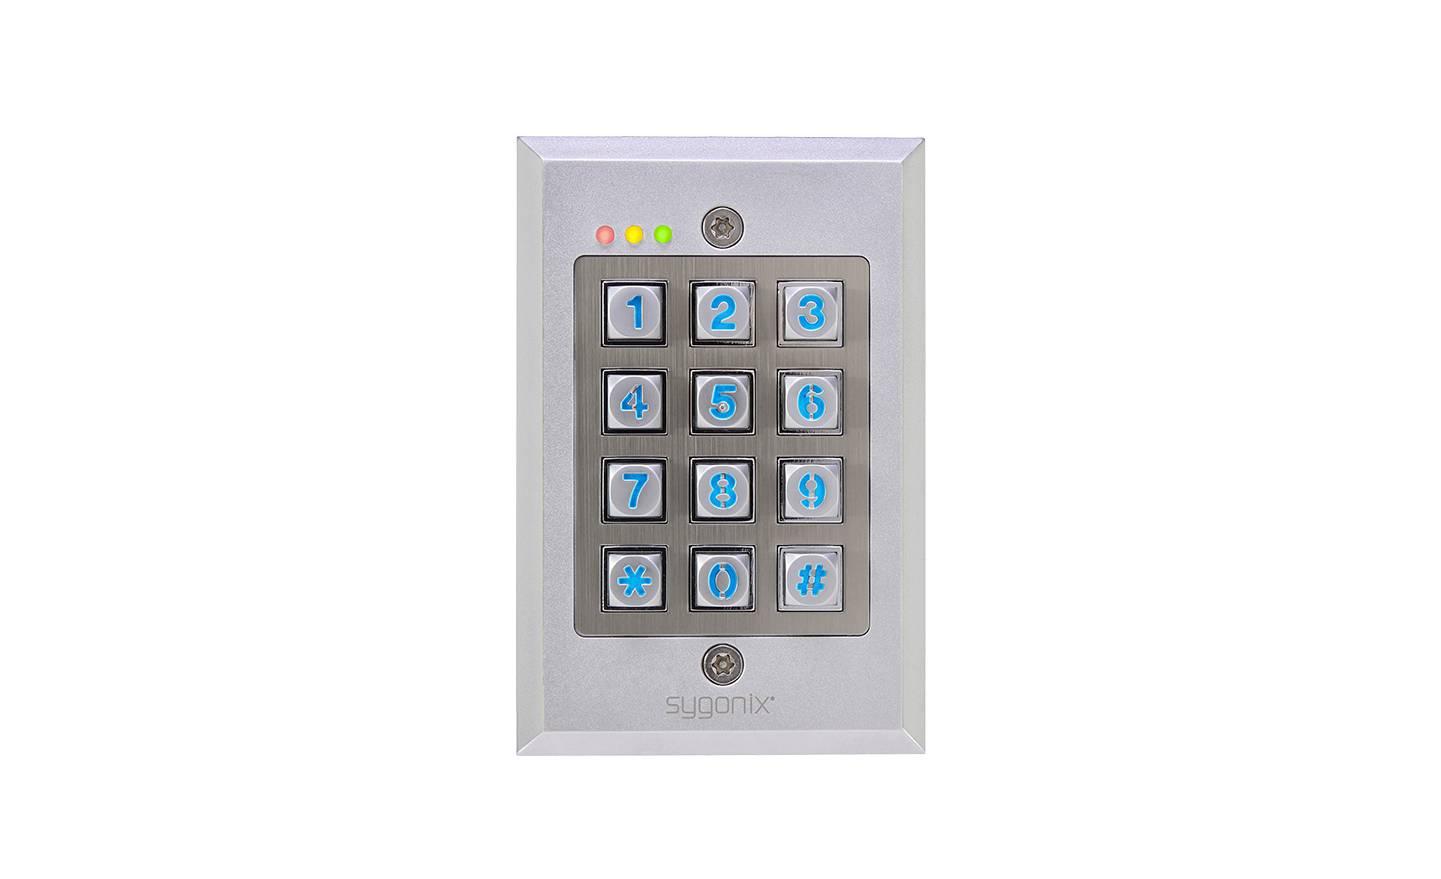 Sygonix - Türen- & Fensterschutz